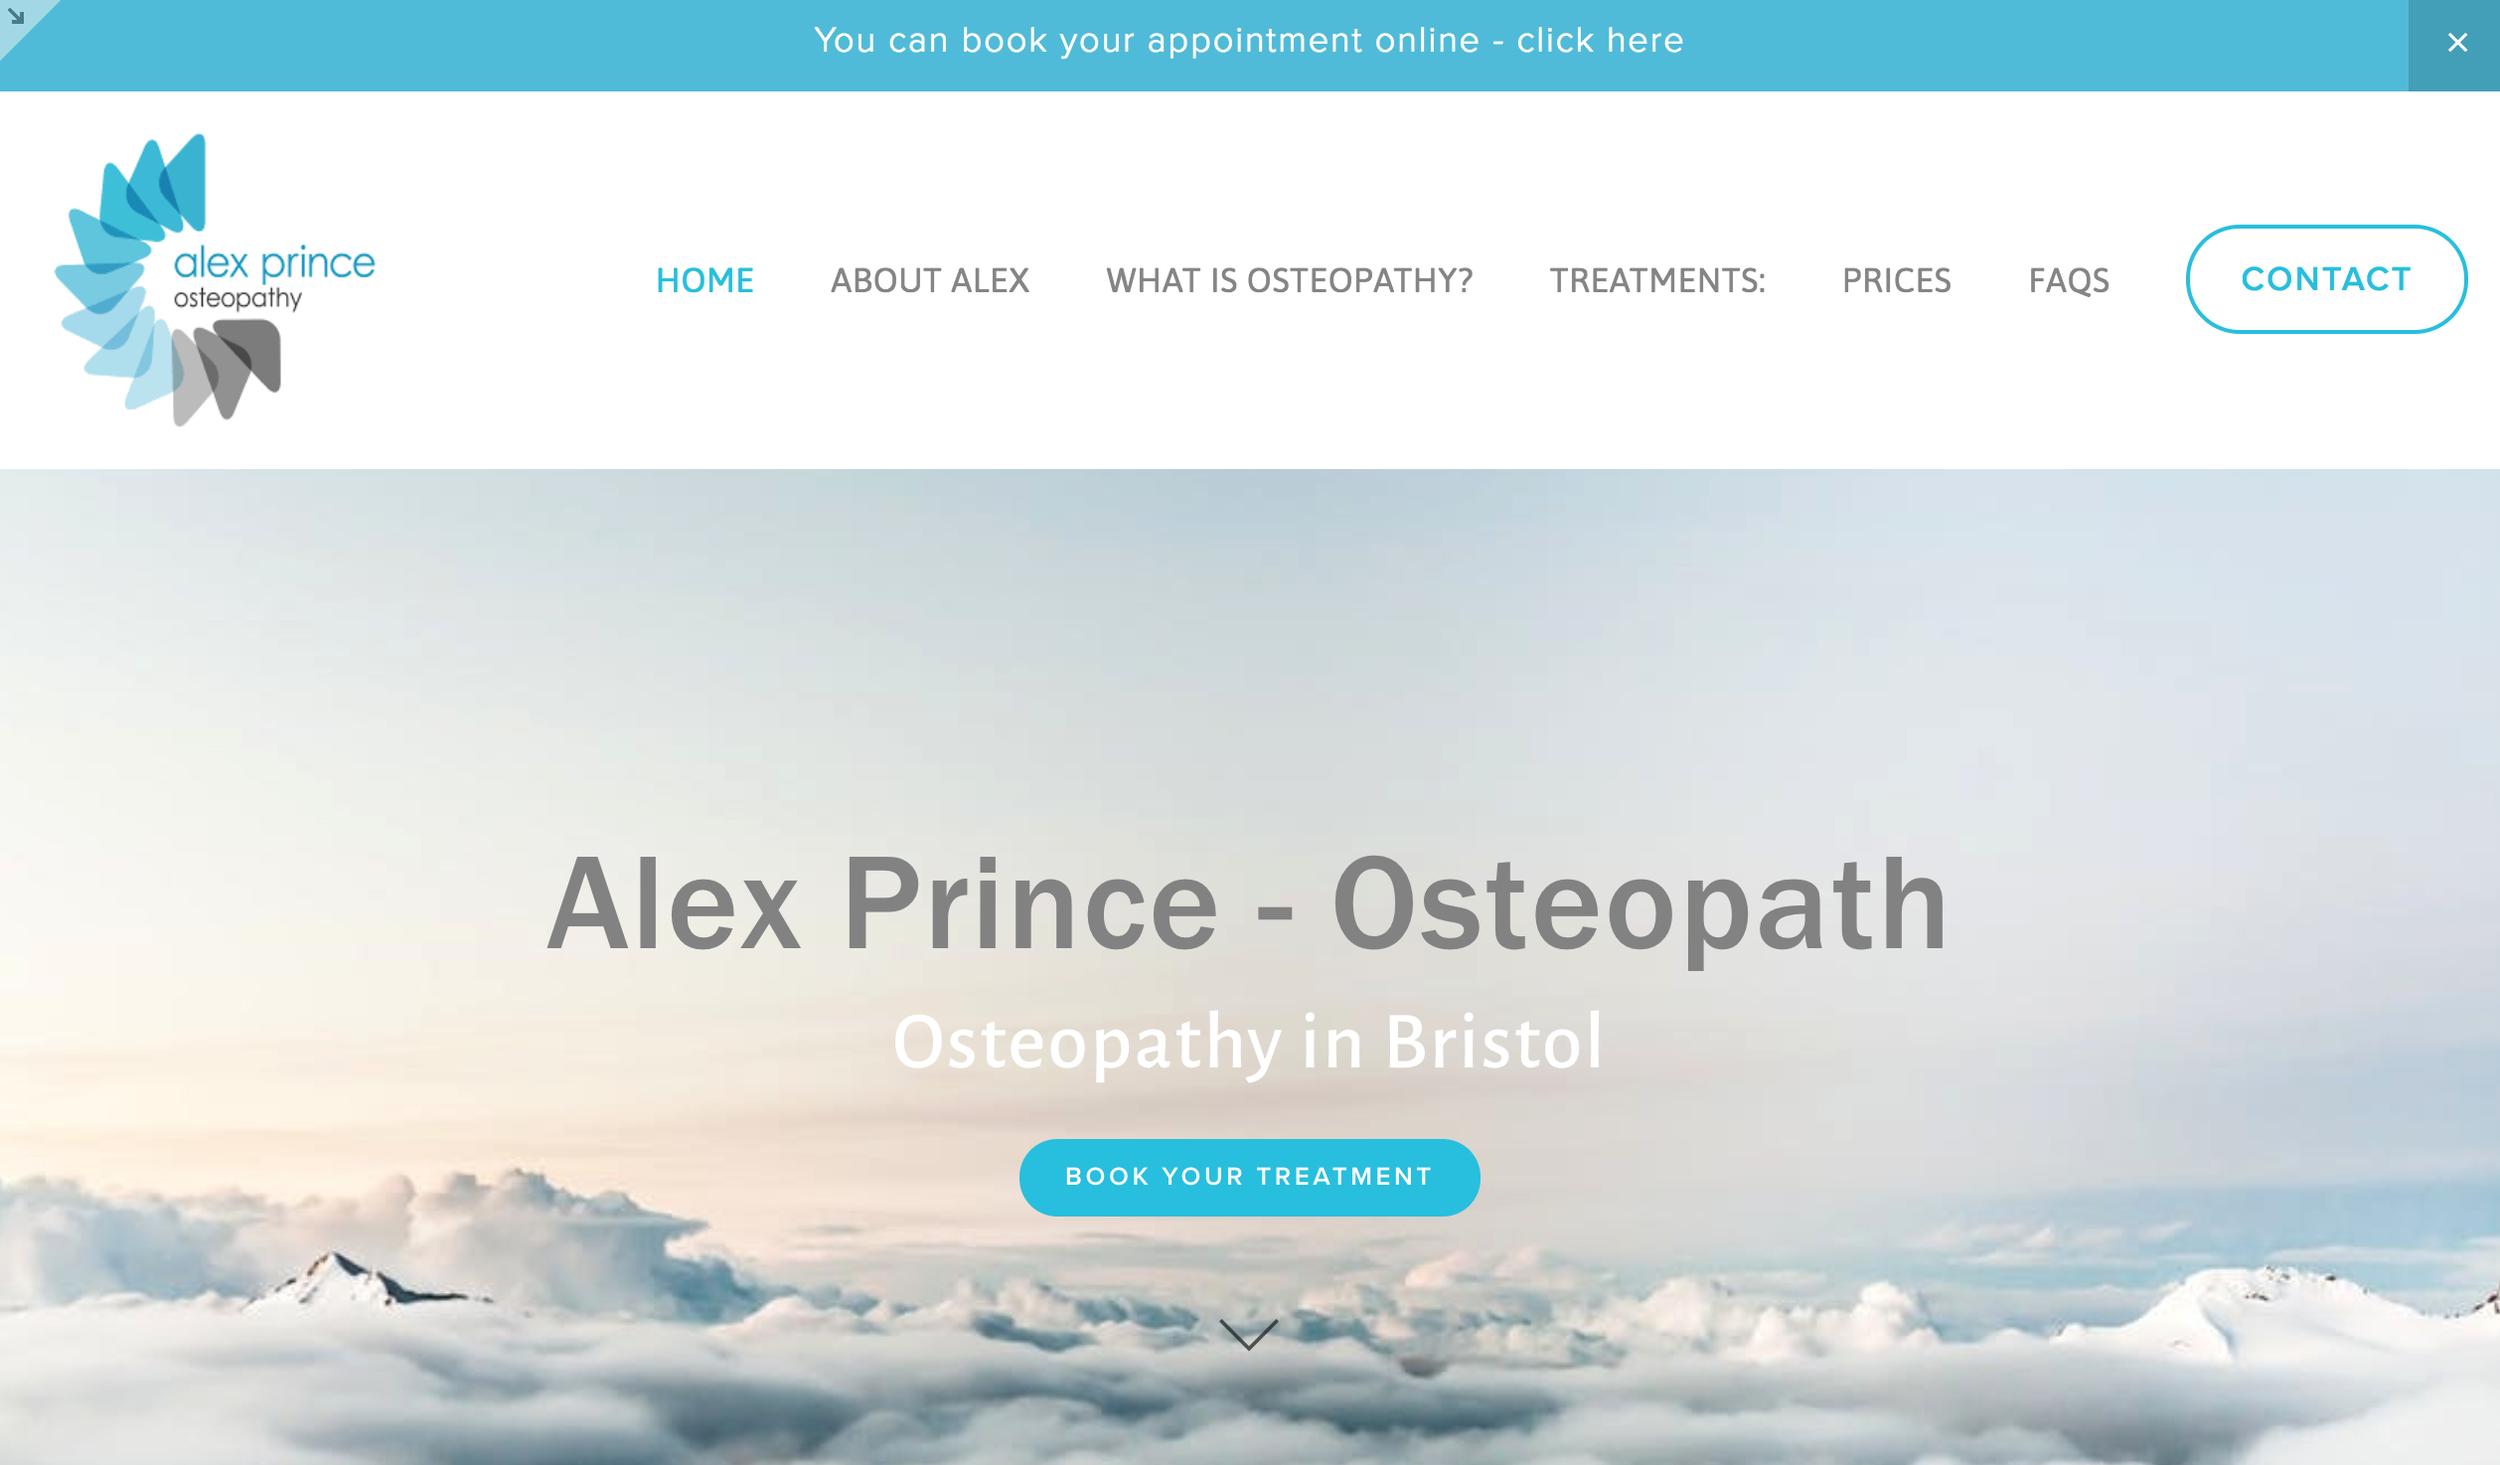 Alex_Prince_website.png